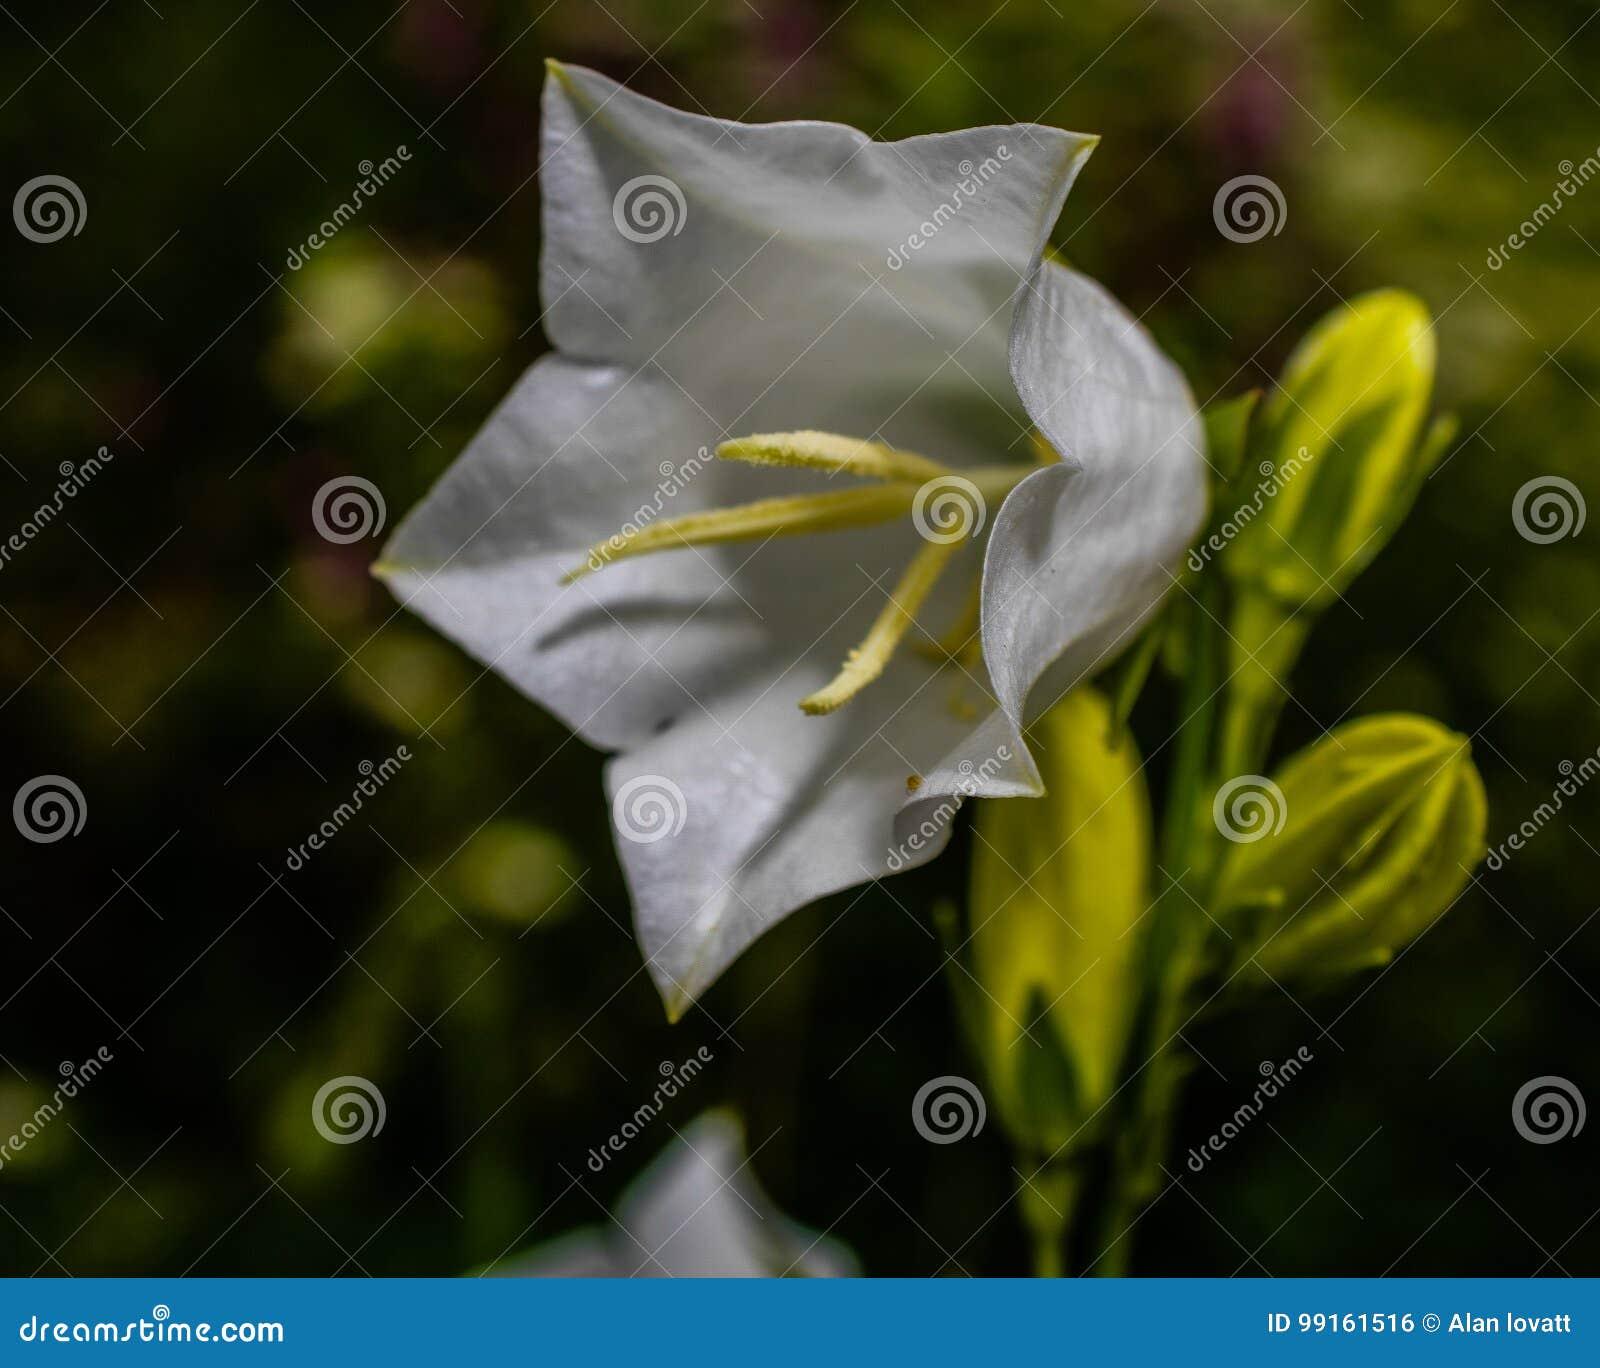 Glorious Flower Of Cuba Jamaican Bell Flower Bedfordshire Macro